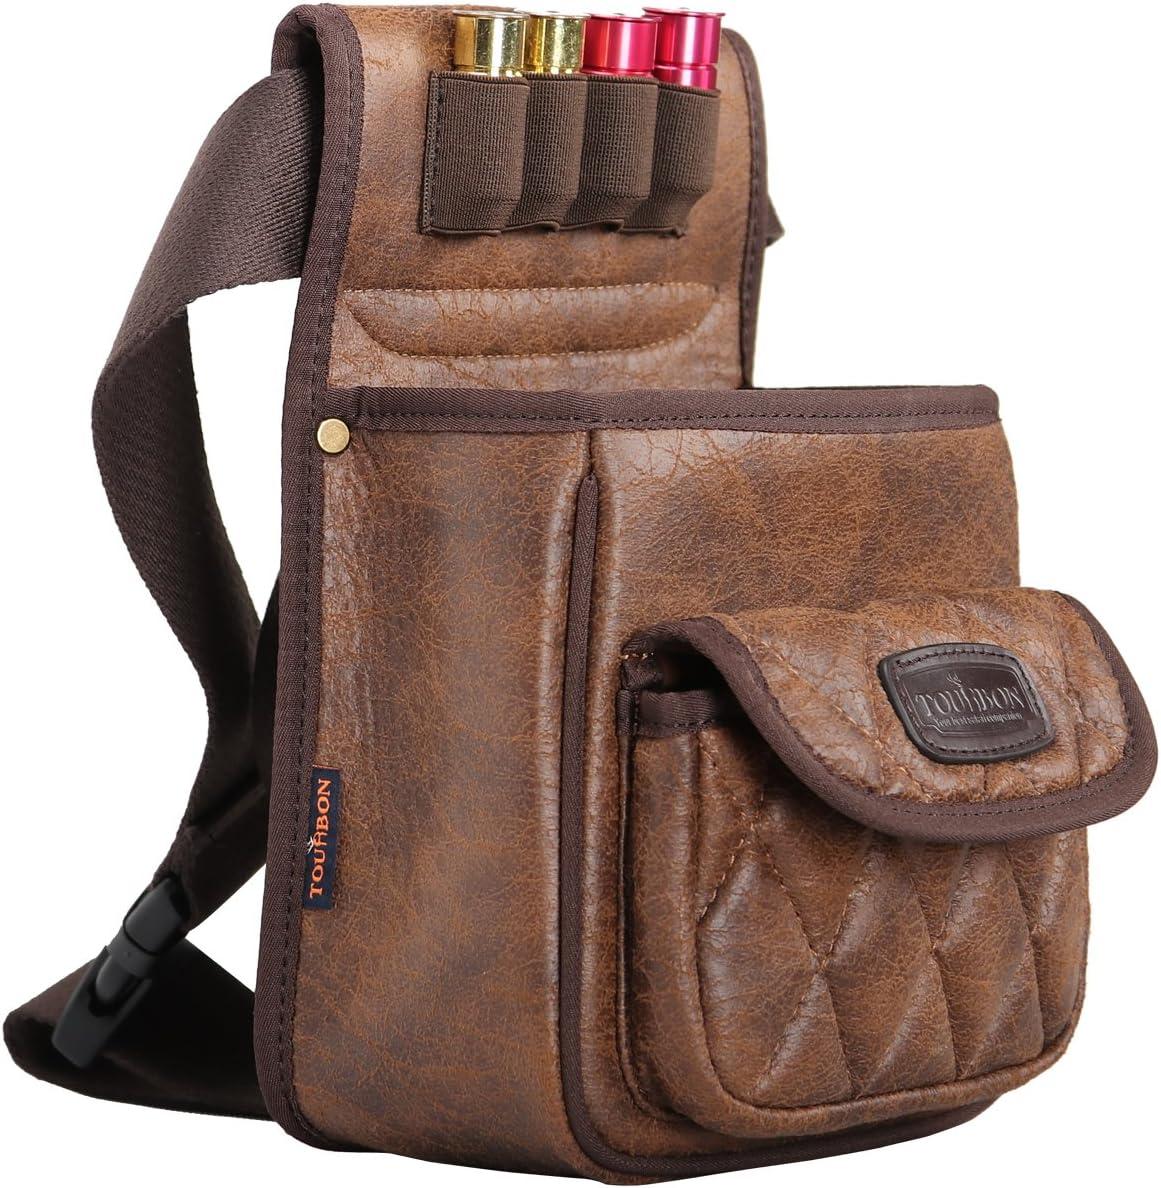 TOURBON PU Leather Shotgun Shell Bag Shooter's Bag for Range/Field 81UbVIgBT9L